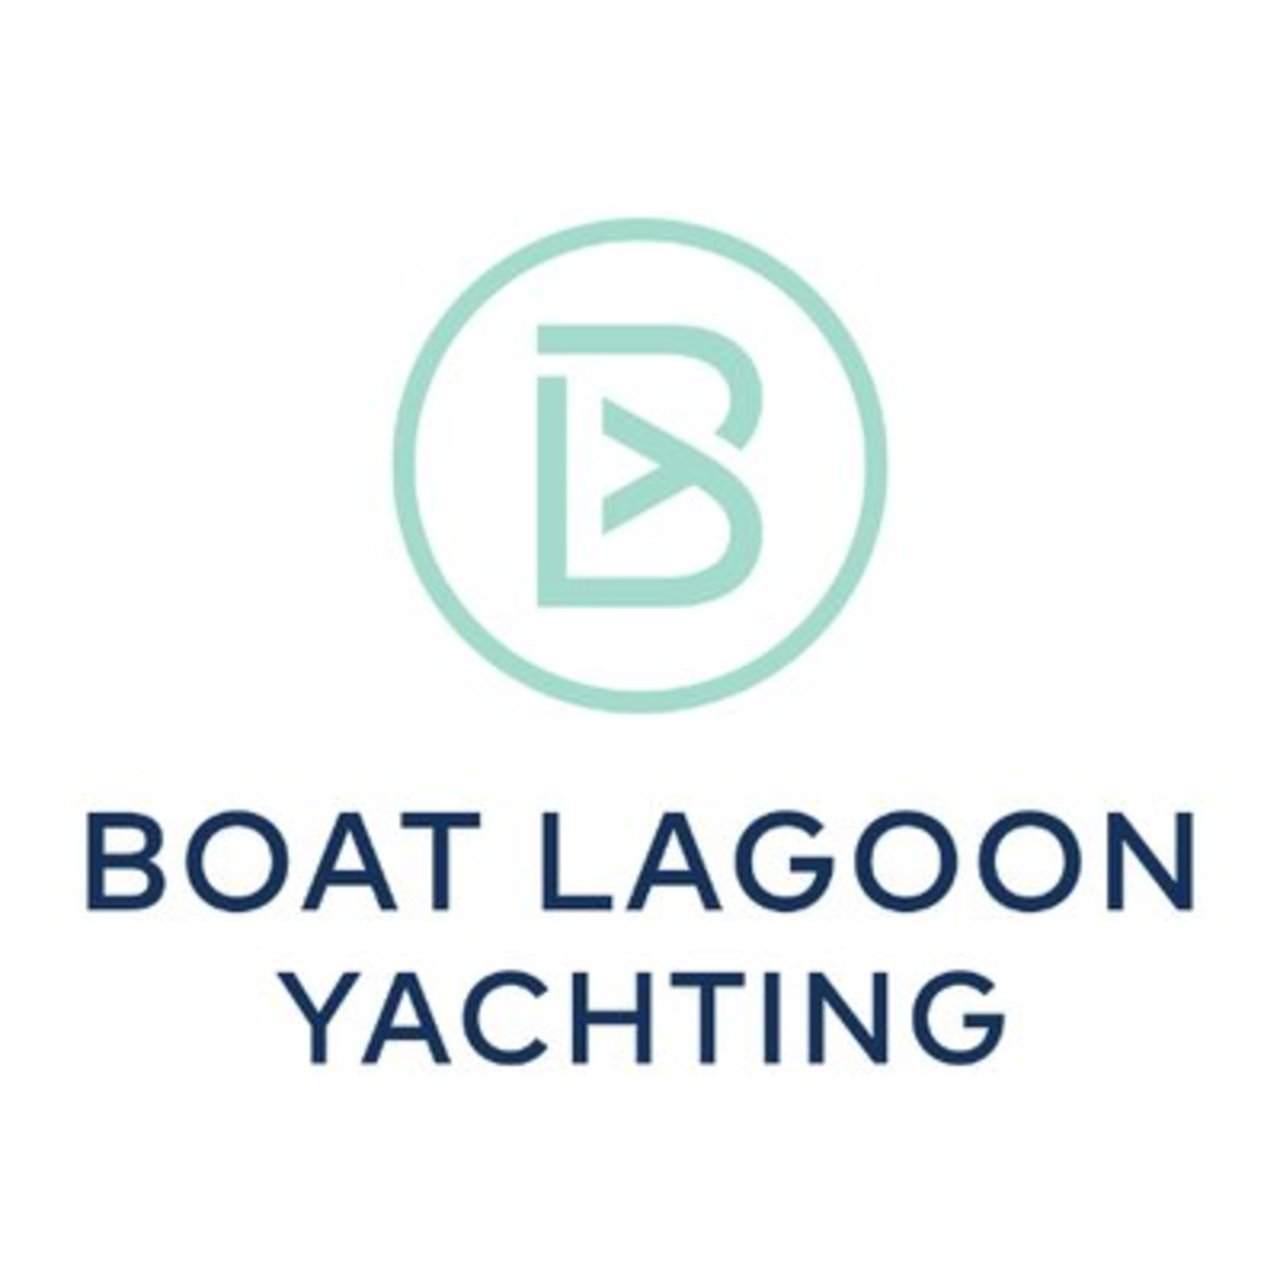 BOAT LAGOON YACHTING CO. Ltd